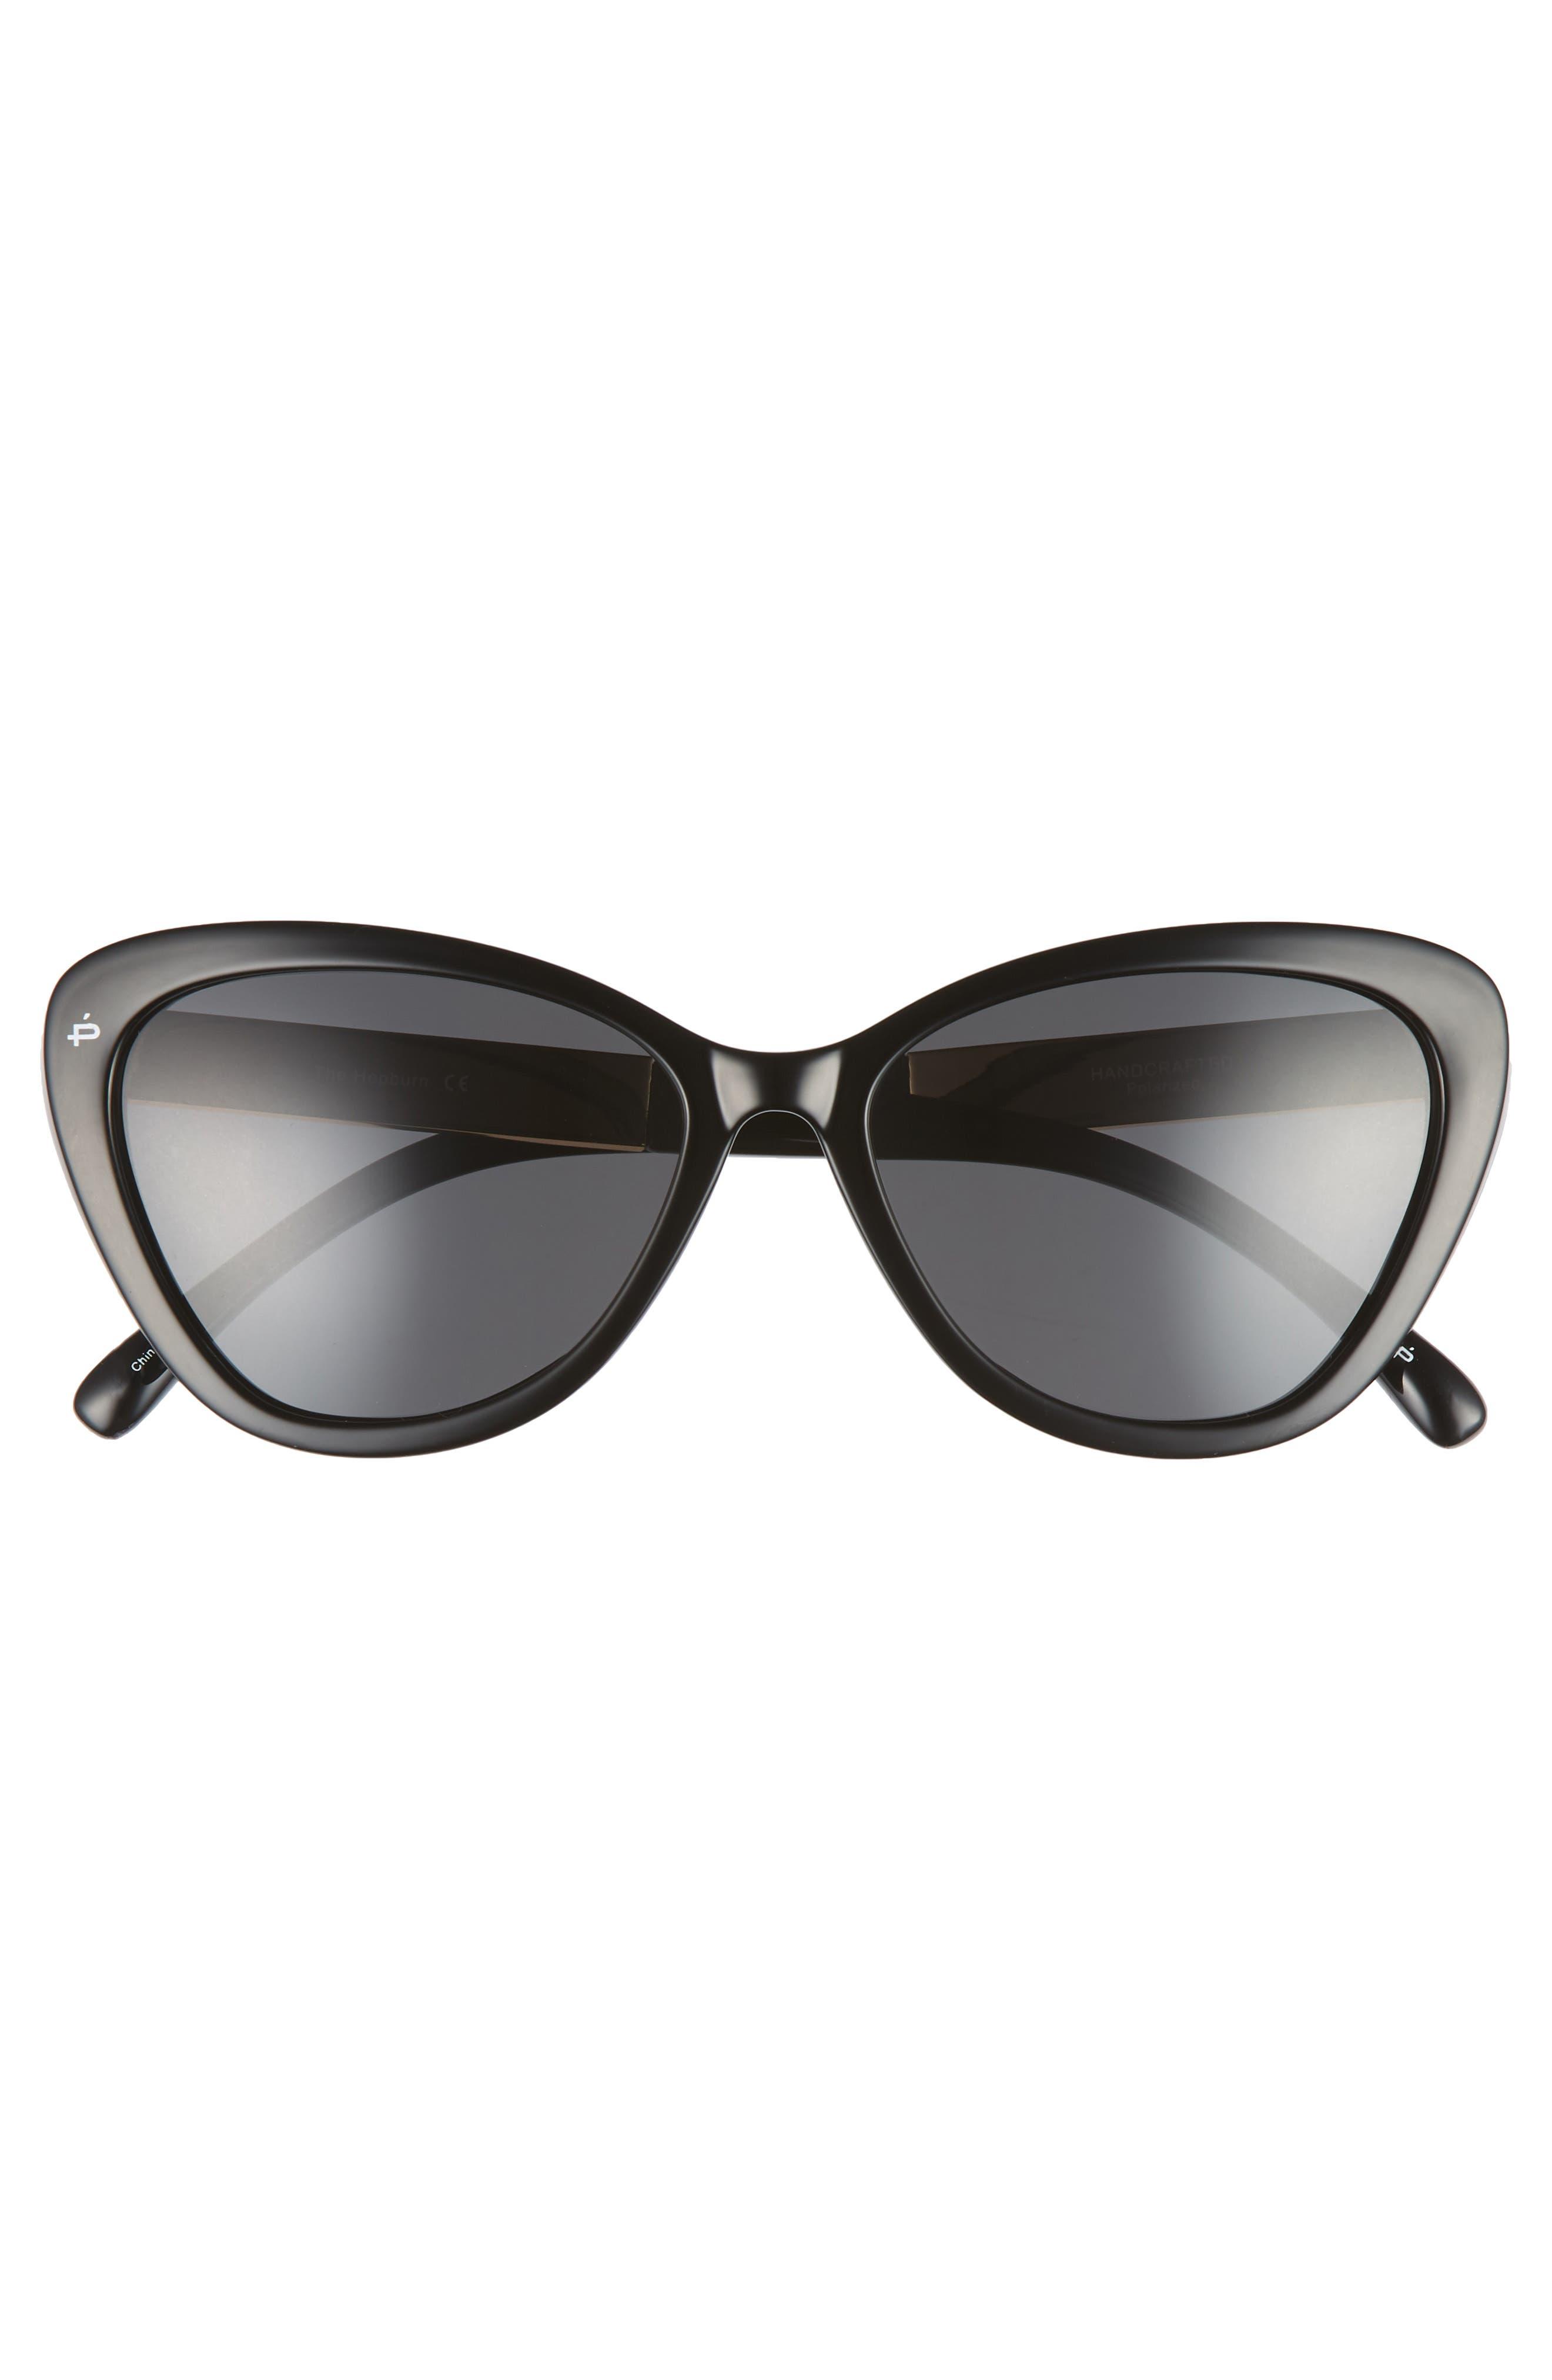 Privé Revaux The Hepburn 56mm Cat Eye Sunglasses,                             Alternate thumbnail 3, color,                             BLACK